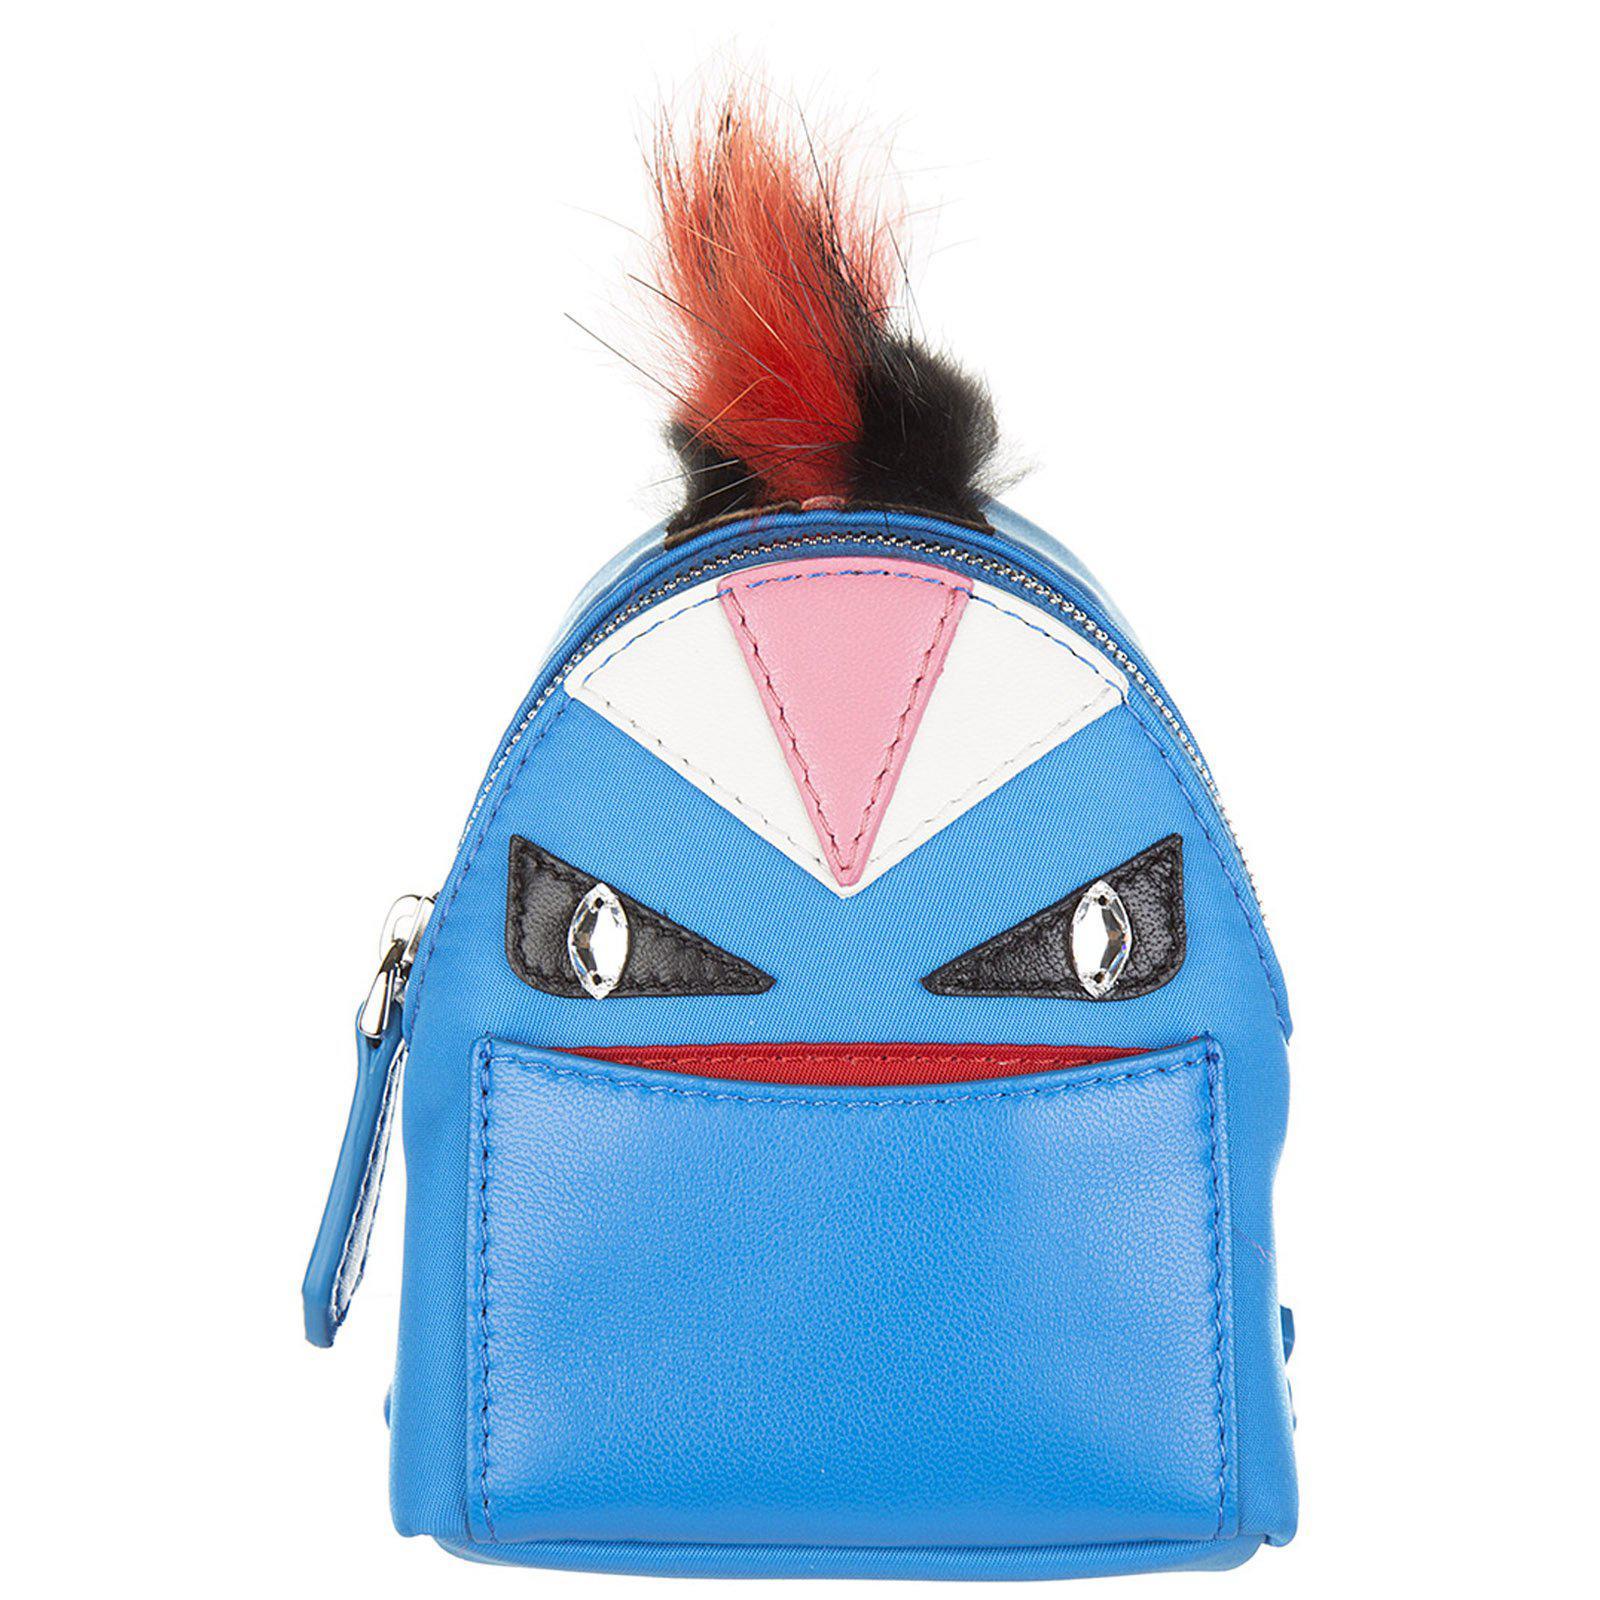 17f3150798 Lyst - Fendi Bag Bugs Backpack Charm in Blue - Save 38%